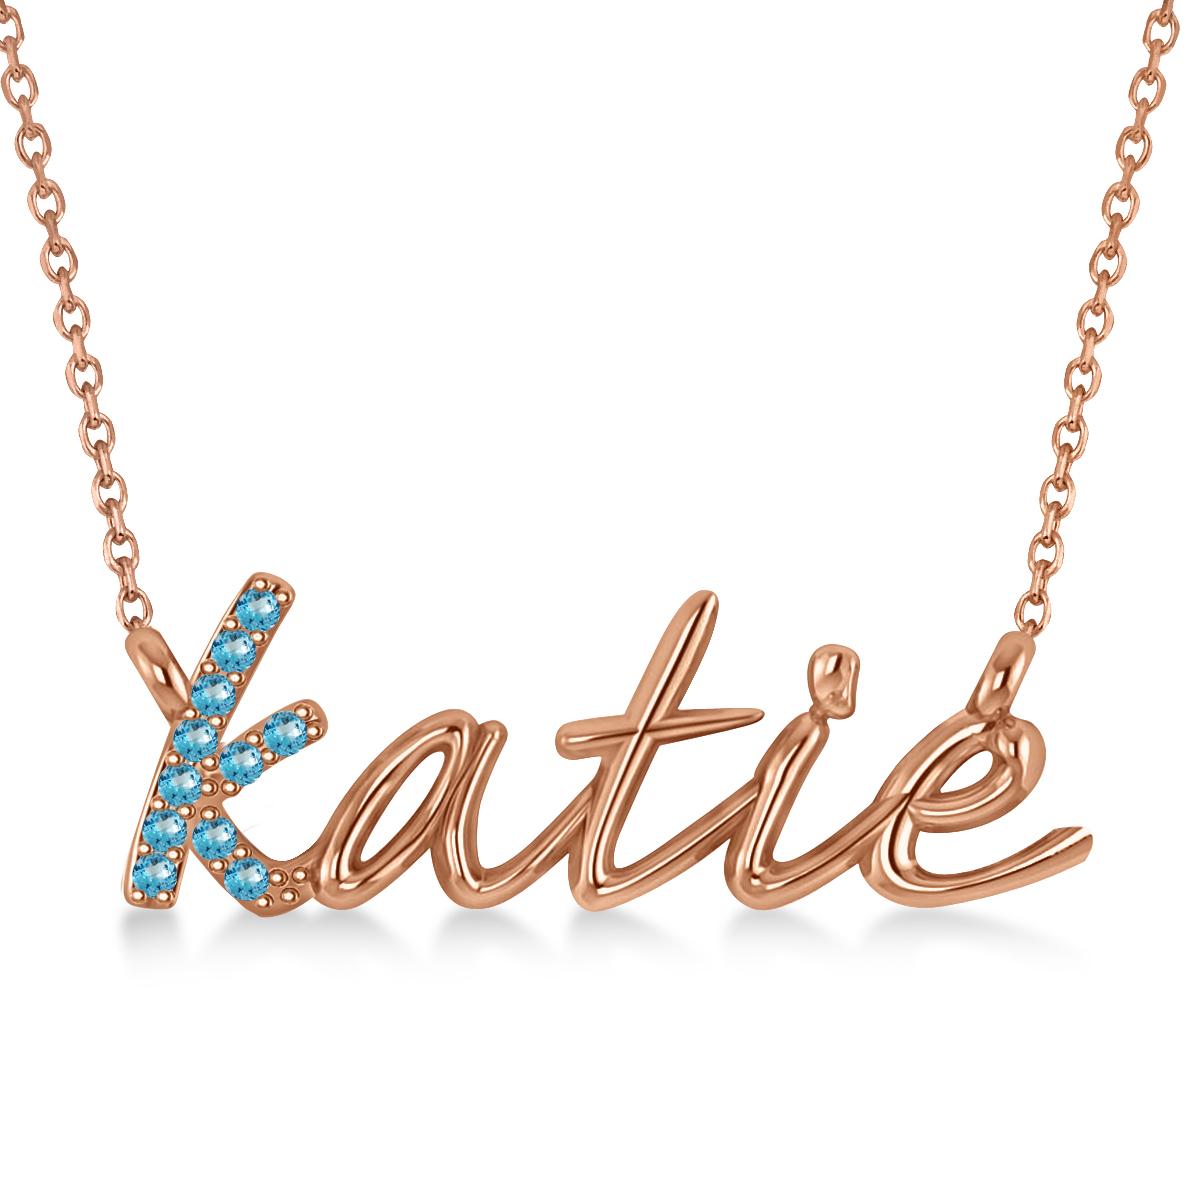 Personalized Blue Topaz Nameplate Pendant Necklace 14k Rose Gold